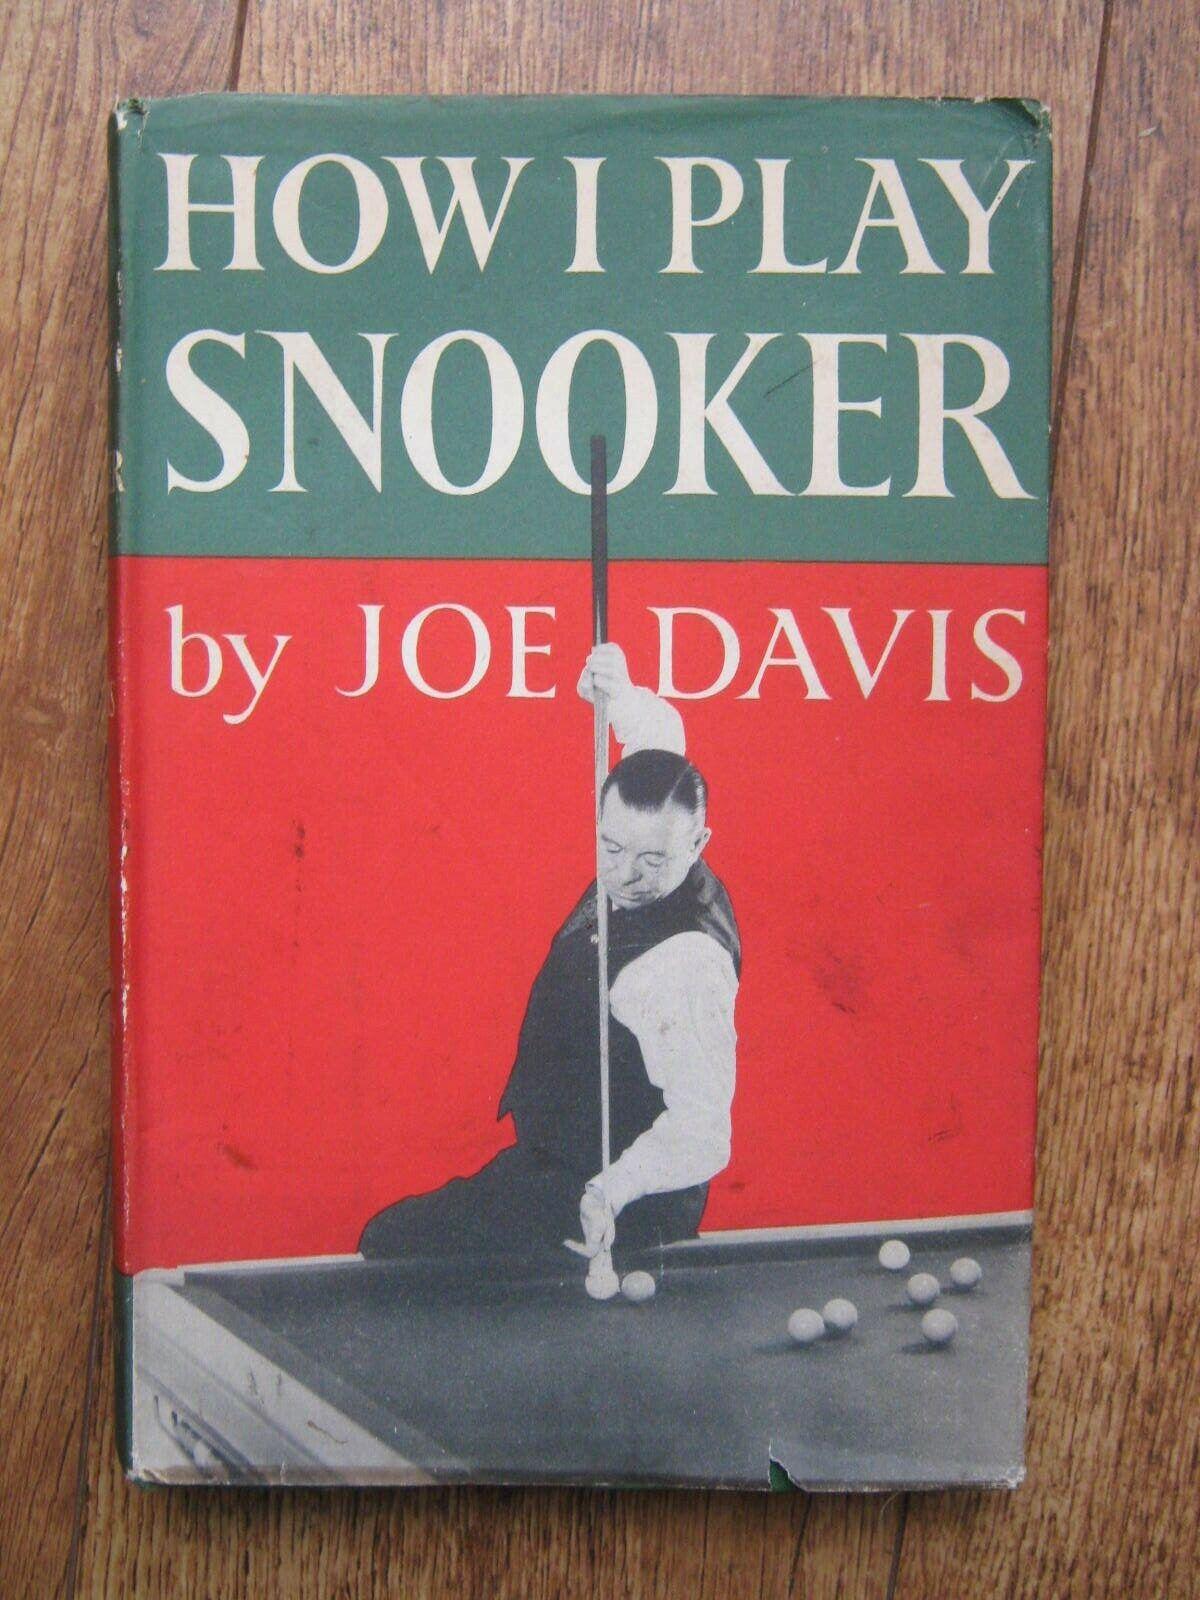 1949 HOW I PLAY SNOOKER by JOE DAVIS HARDBACK BOOK and DUST JACKET: 1st EDITION.